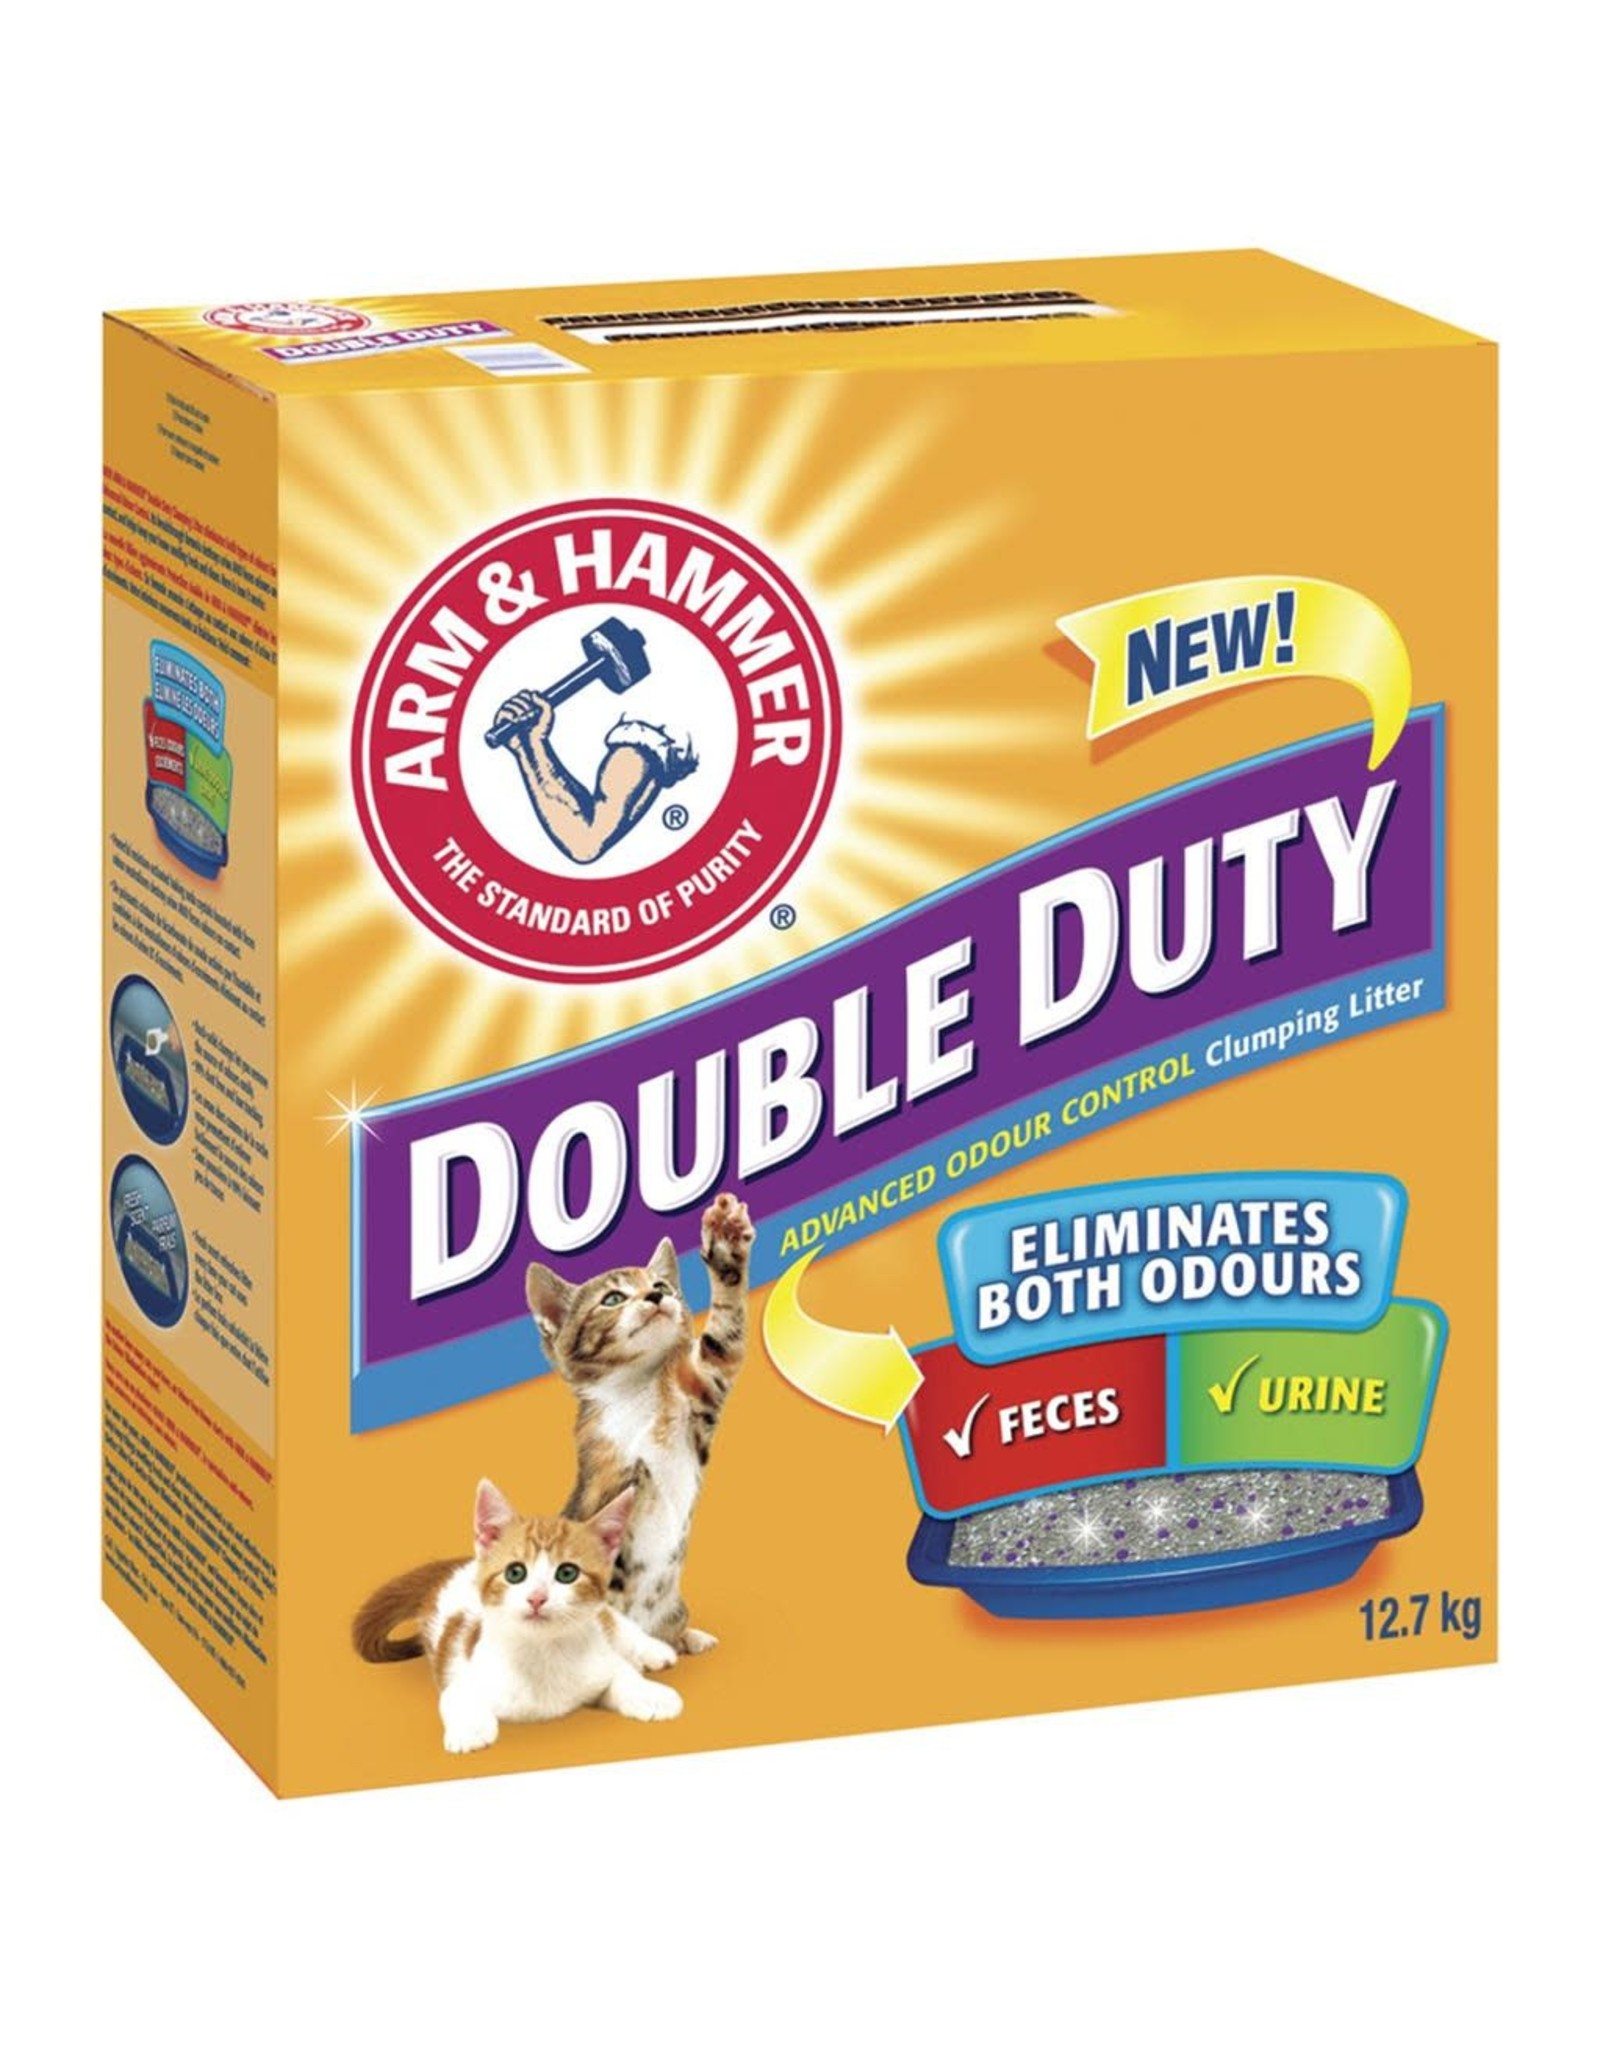 A&H A&H Double Duty Clumping Litter 12.7KG